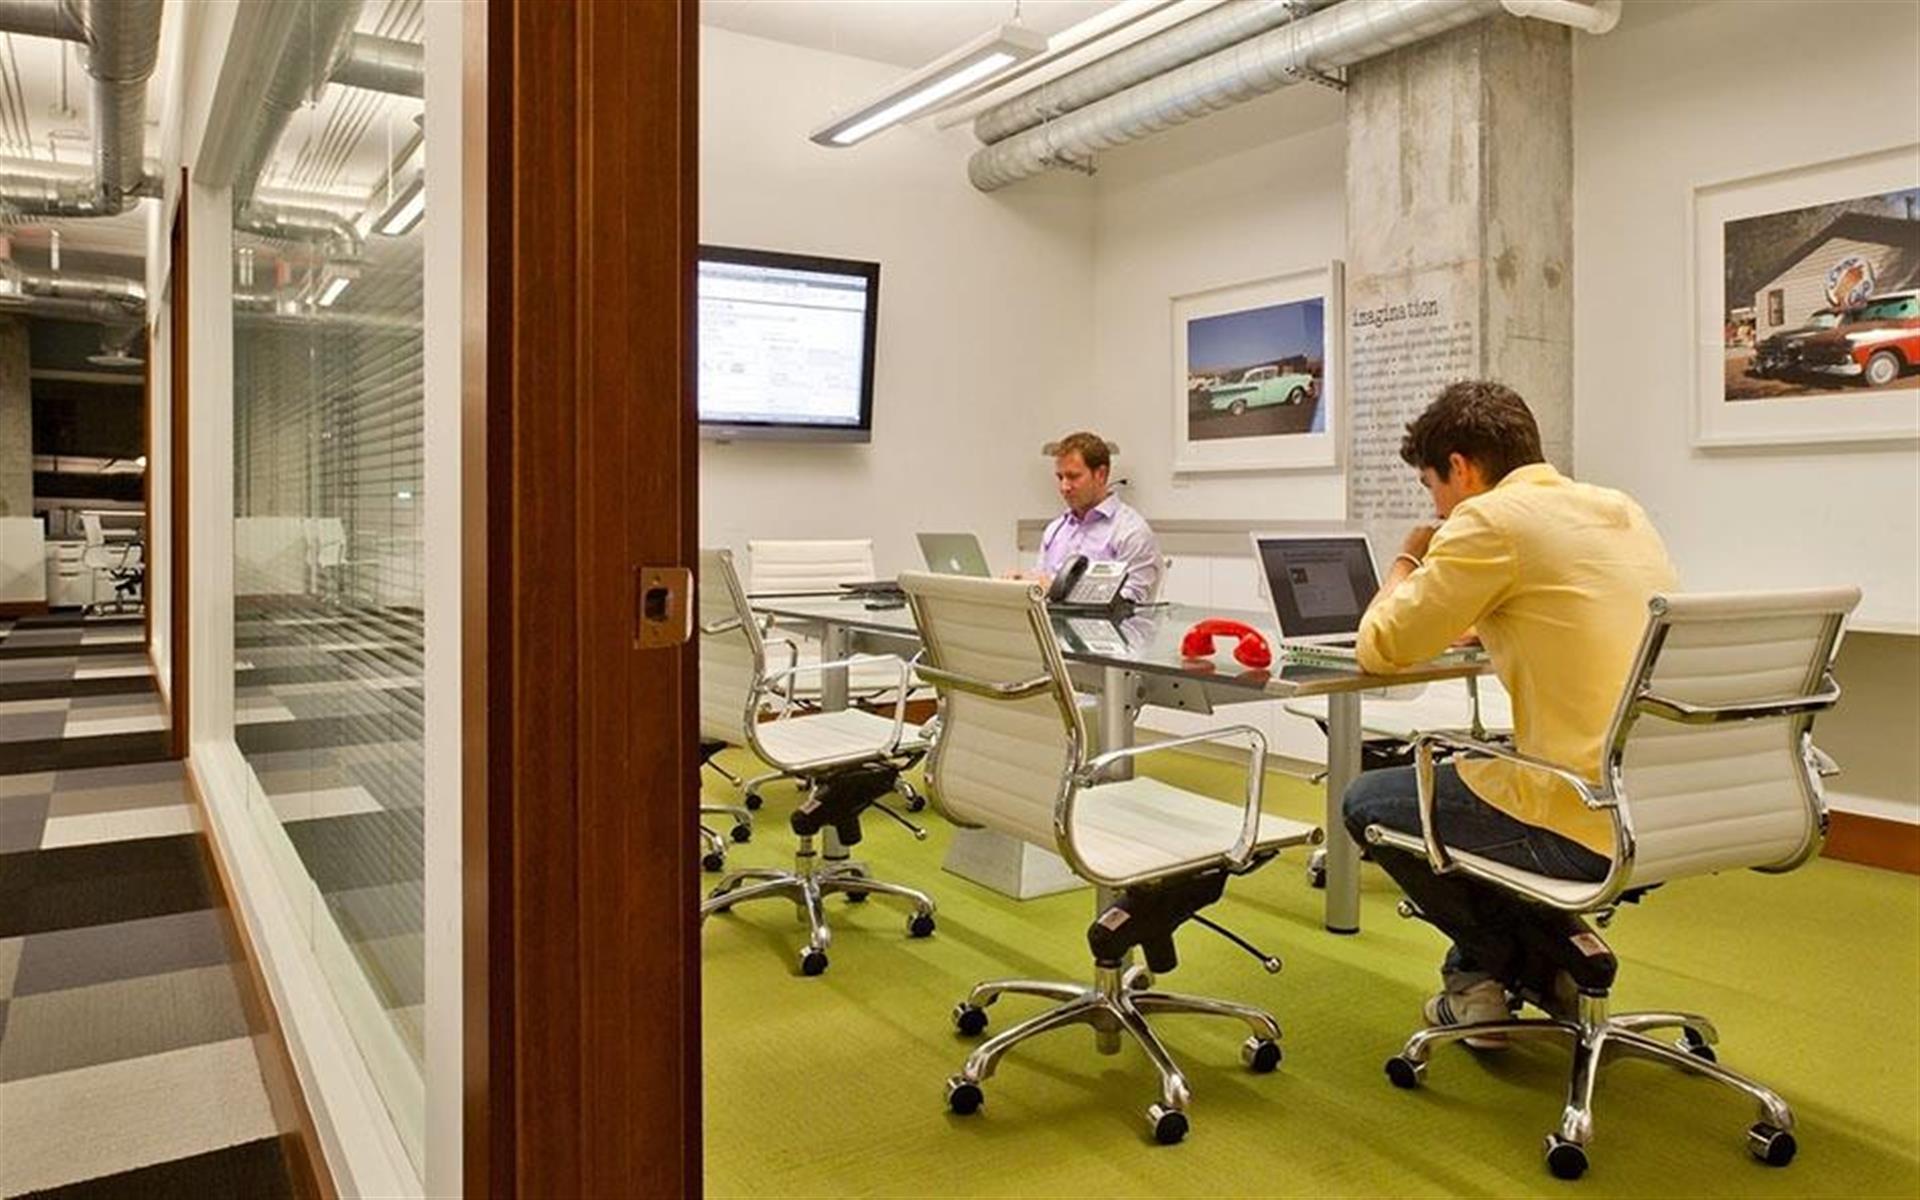 Büro Midtown - Conference Room